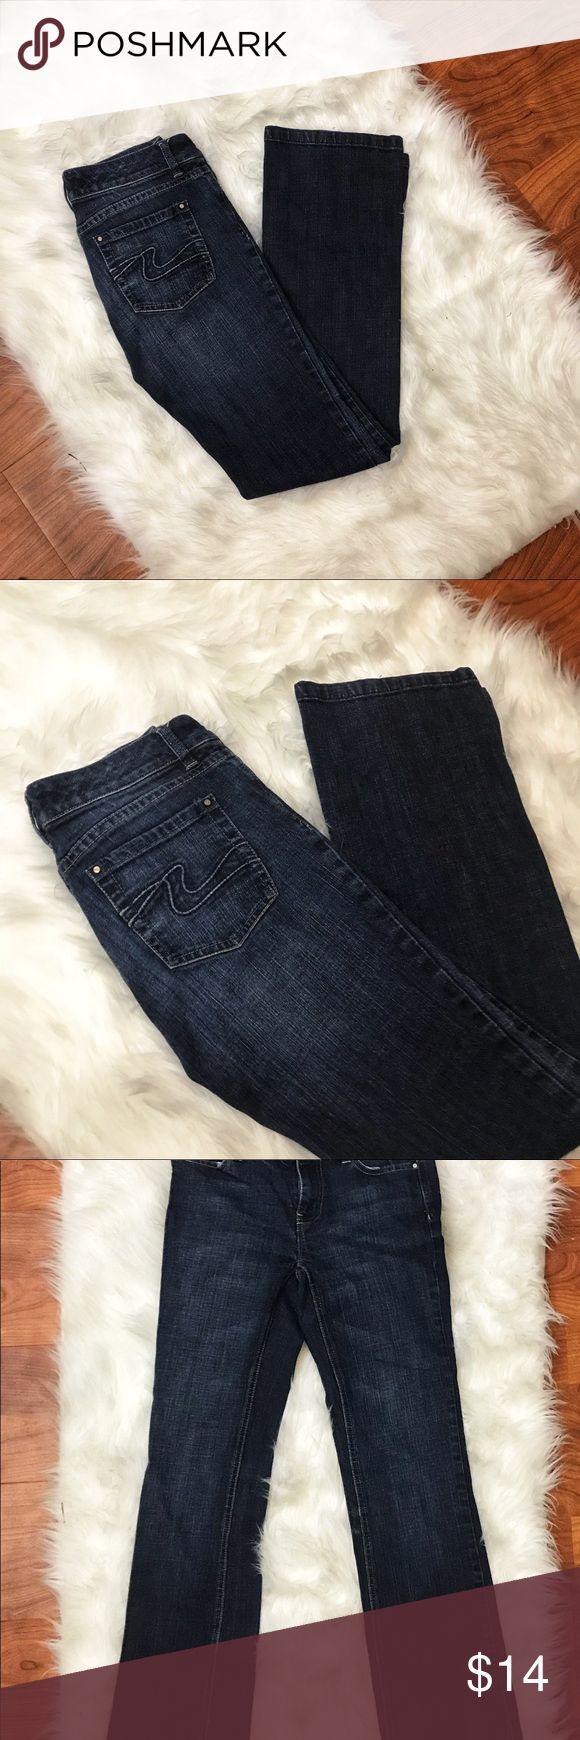 White House Black Market Bootleg Jeans 0 Classic bootleg Jeans from White House Black Market - Size 0 - Darkwash / Pocket Design / EUC  - Waist 14 Rise 7 Inseam 28 White House Black Market Jeans Boot Cut